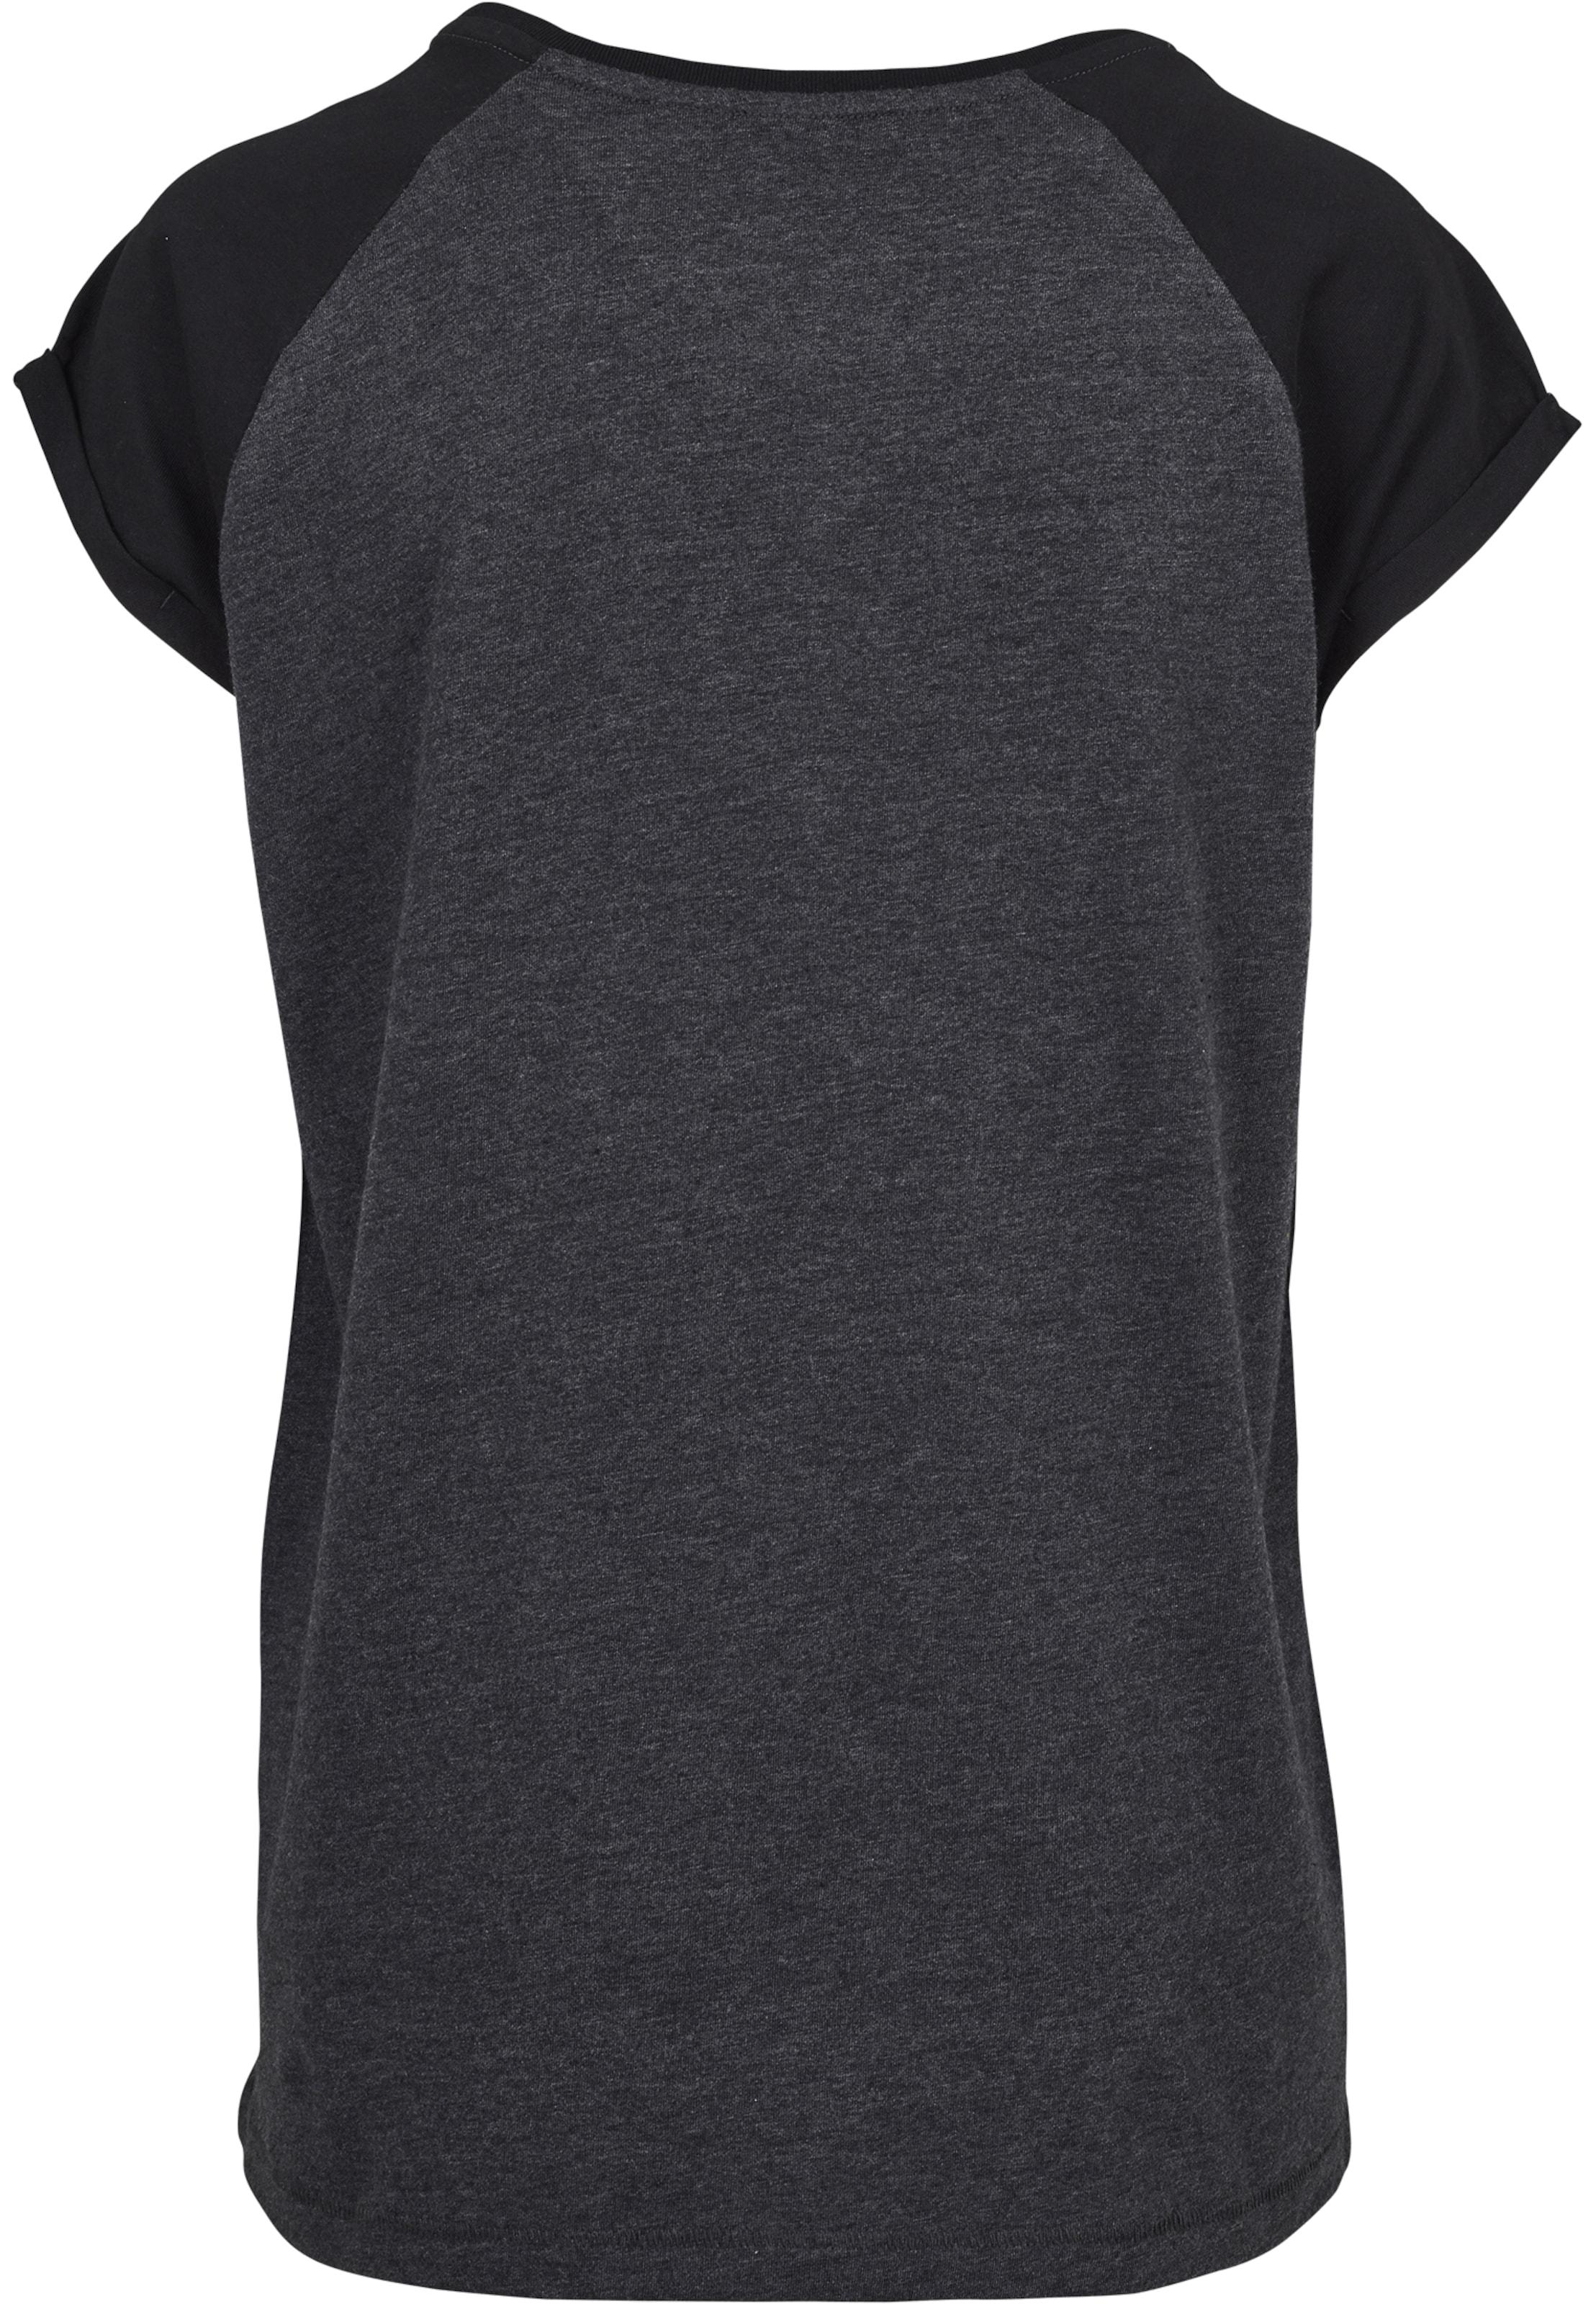 shirt Classics En GrisNoir Urban T Oversize 35uTKJF1cl